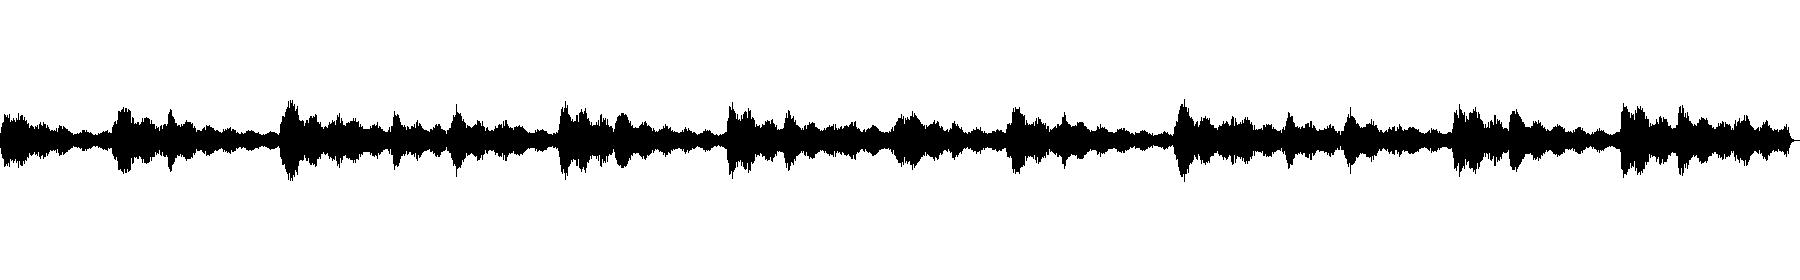 lofi rhodes 80